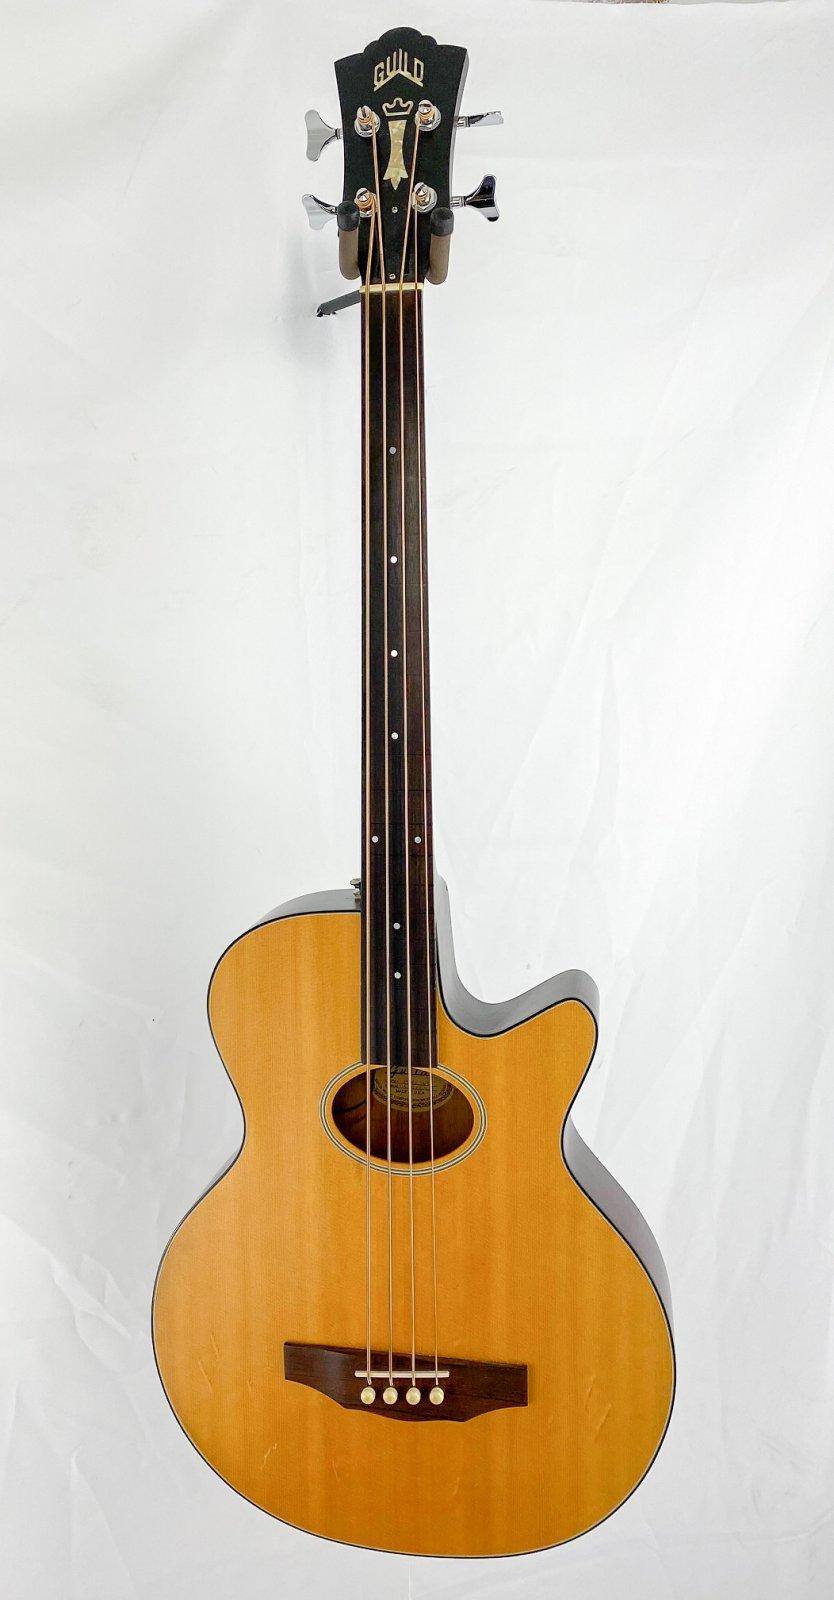 1993 Guild BRCE Acoustic/Electric Fretless Bass w/OHSC